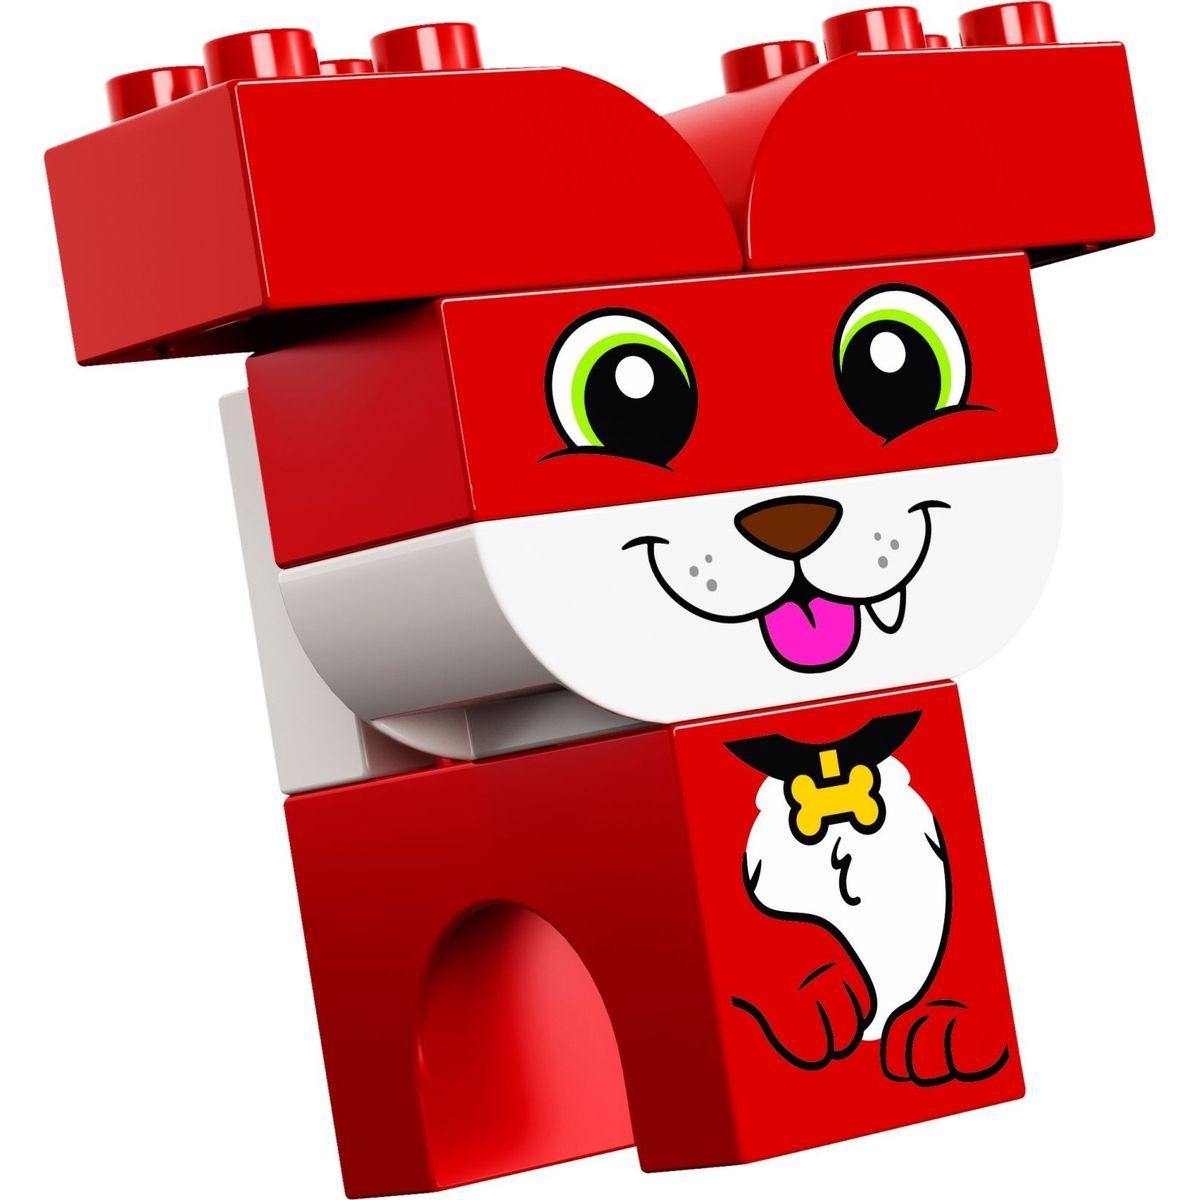 LEGO DUPLO 10858 Moji první skládací mazlíčci #5